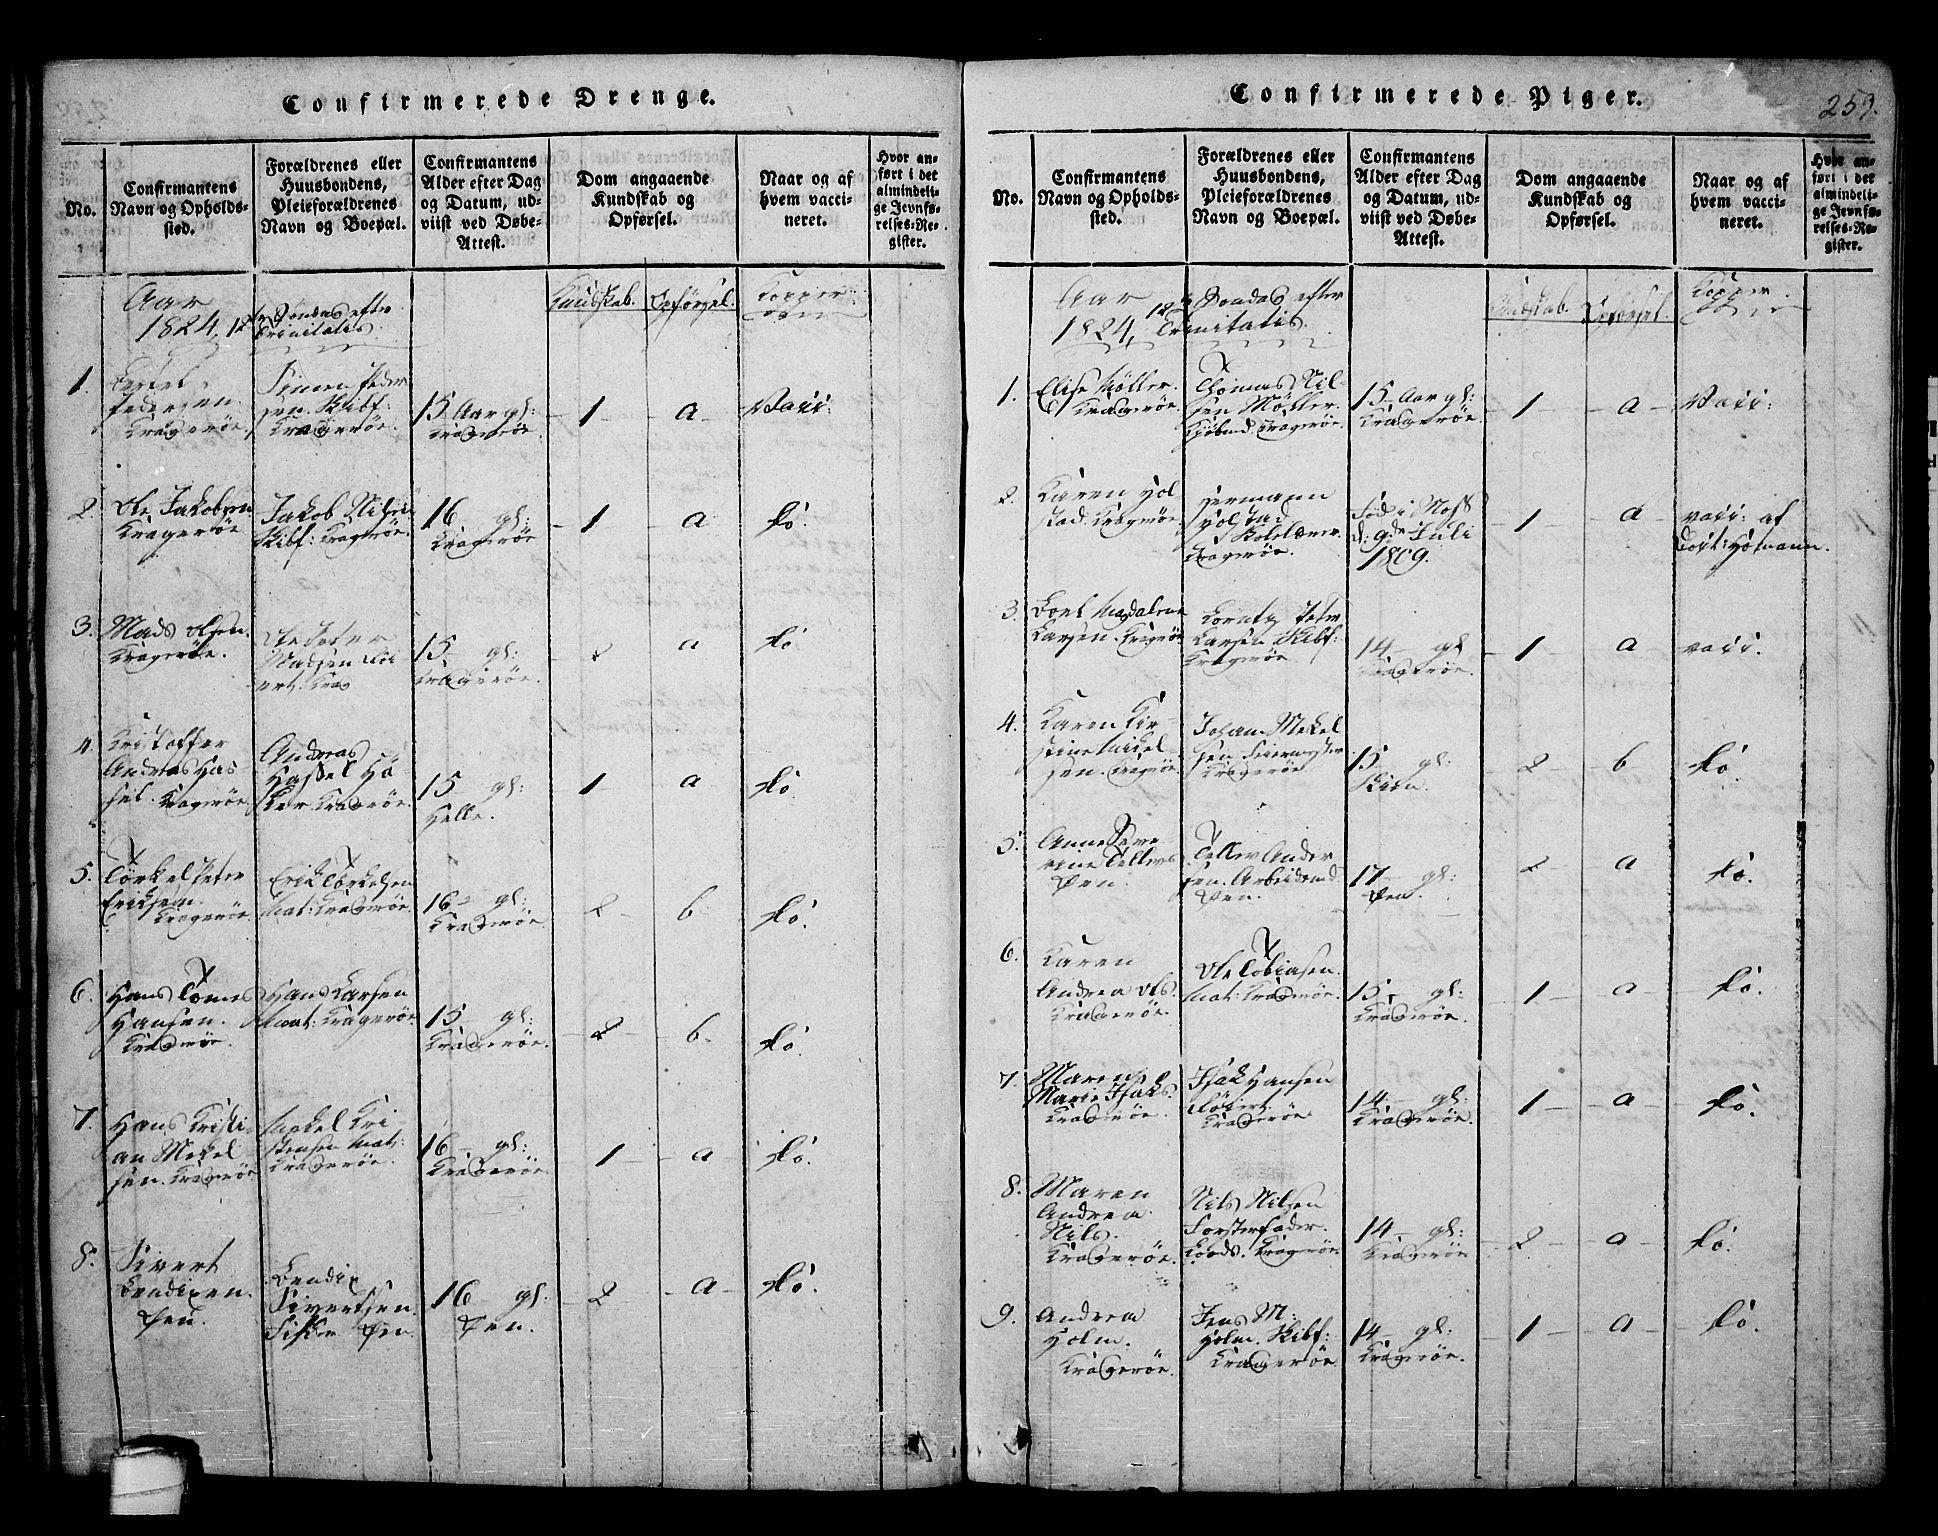 SAKO, Kragerø kirkebøker, F/Fa/L0004: Ministerialbok nr. 4, 1814-1831, s. 259